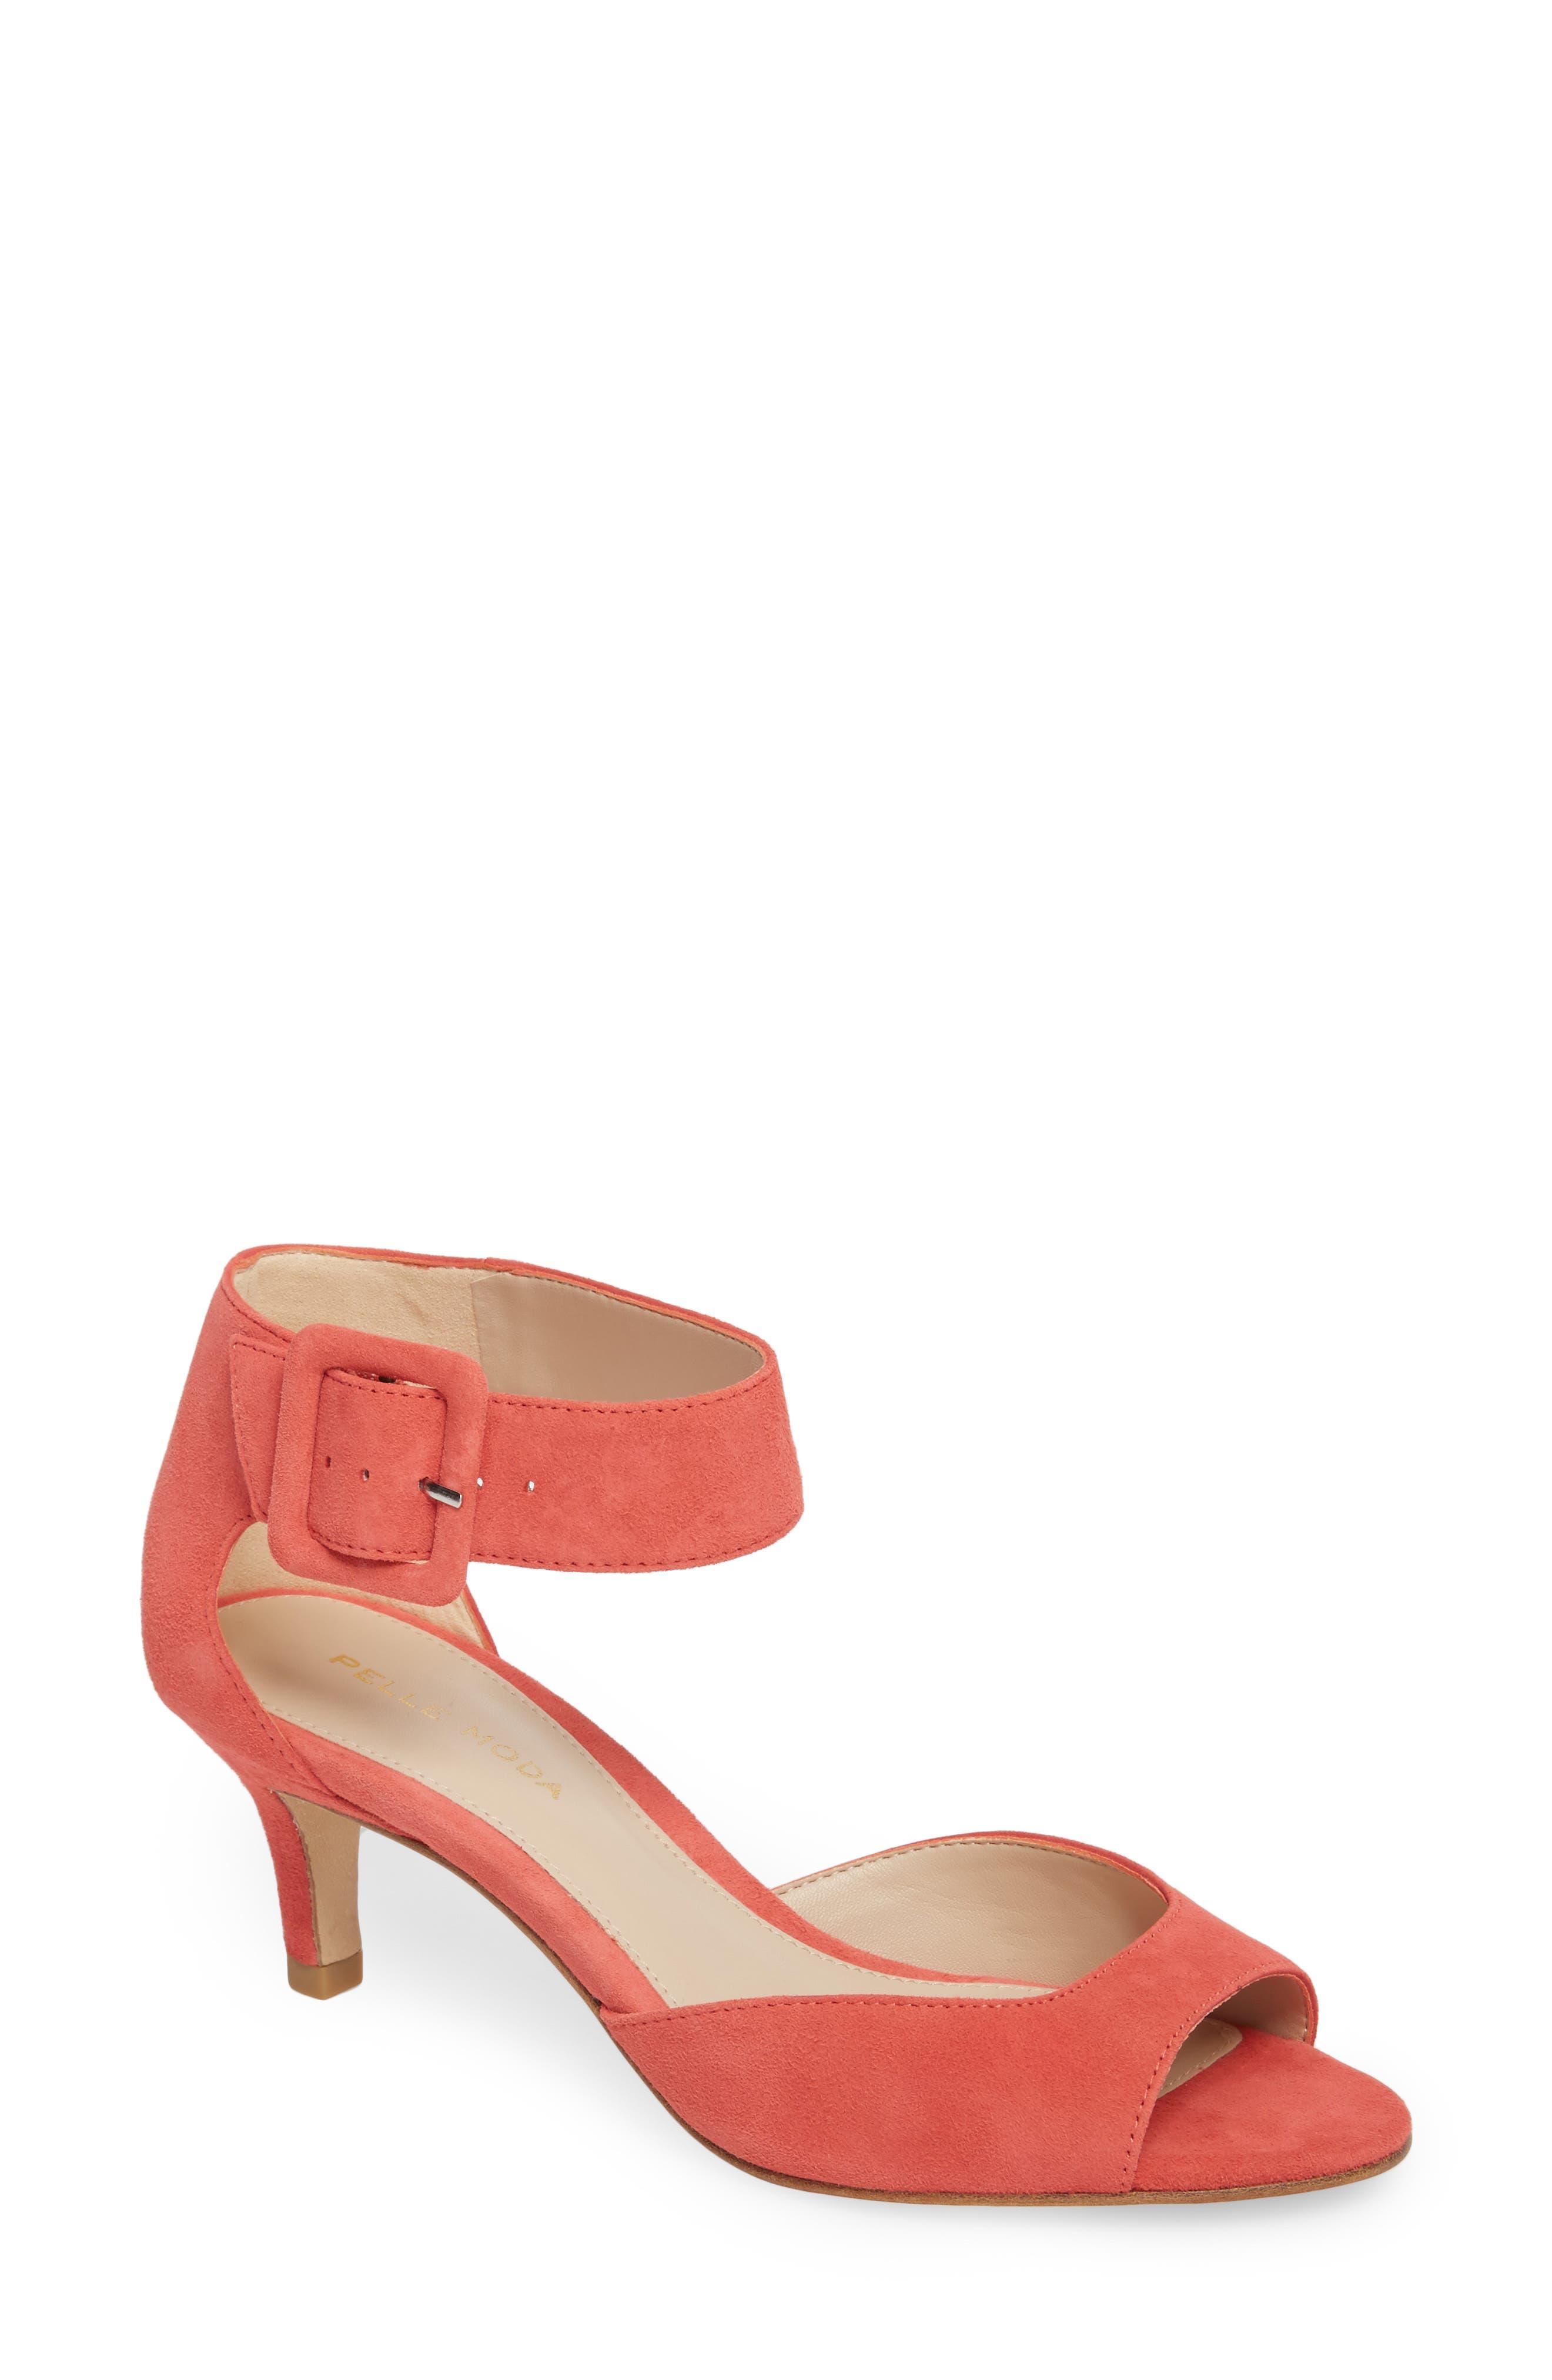 'Berlin' Ankle Strap Sandal,                             Main thumbnail 5, color,